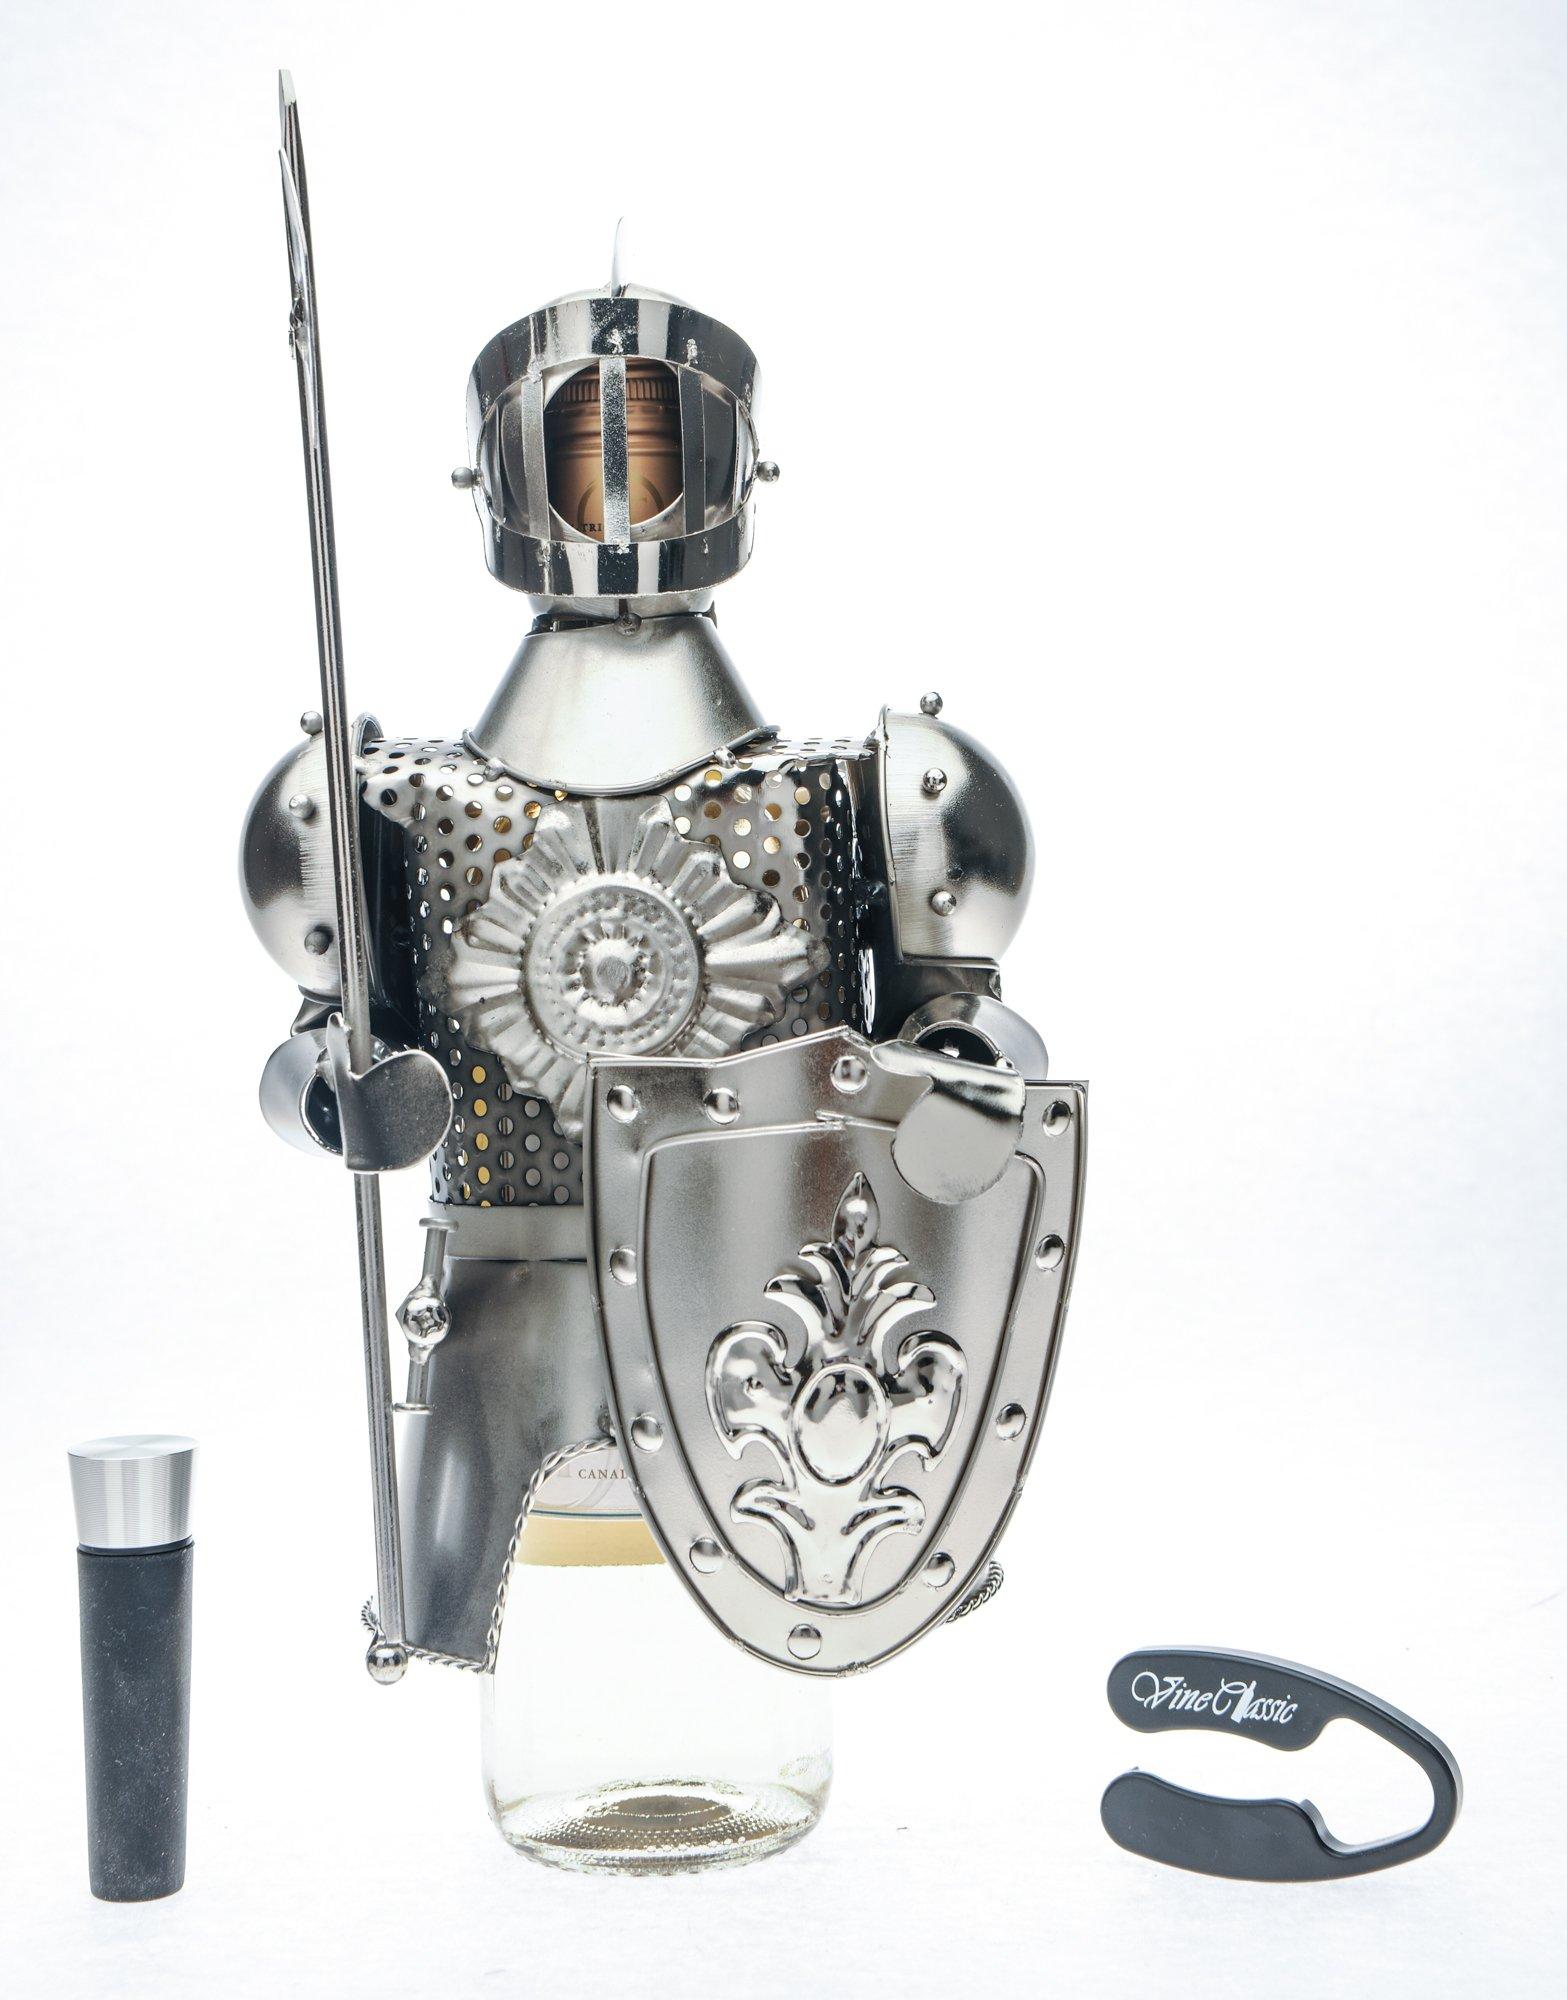 Knight Metal Wine Bottle Holder Plus a Wine Foil Cutter and a Wine Vacuum Bottle Stopper